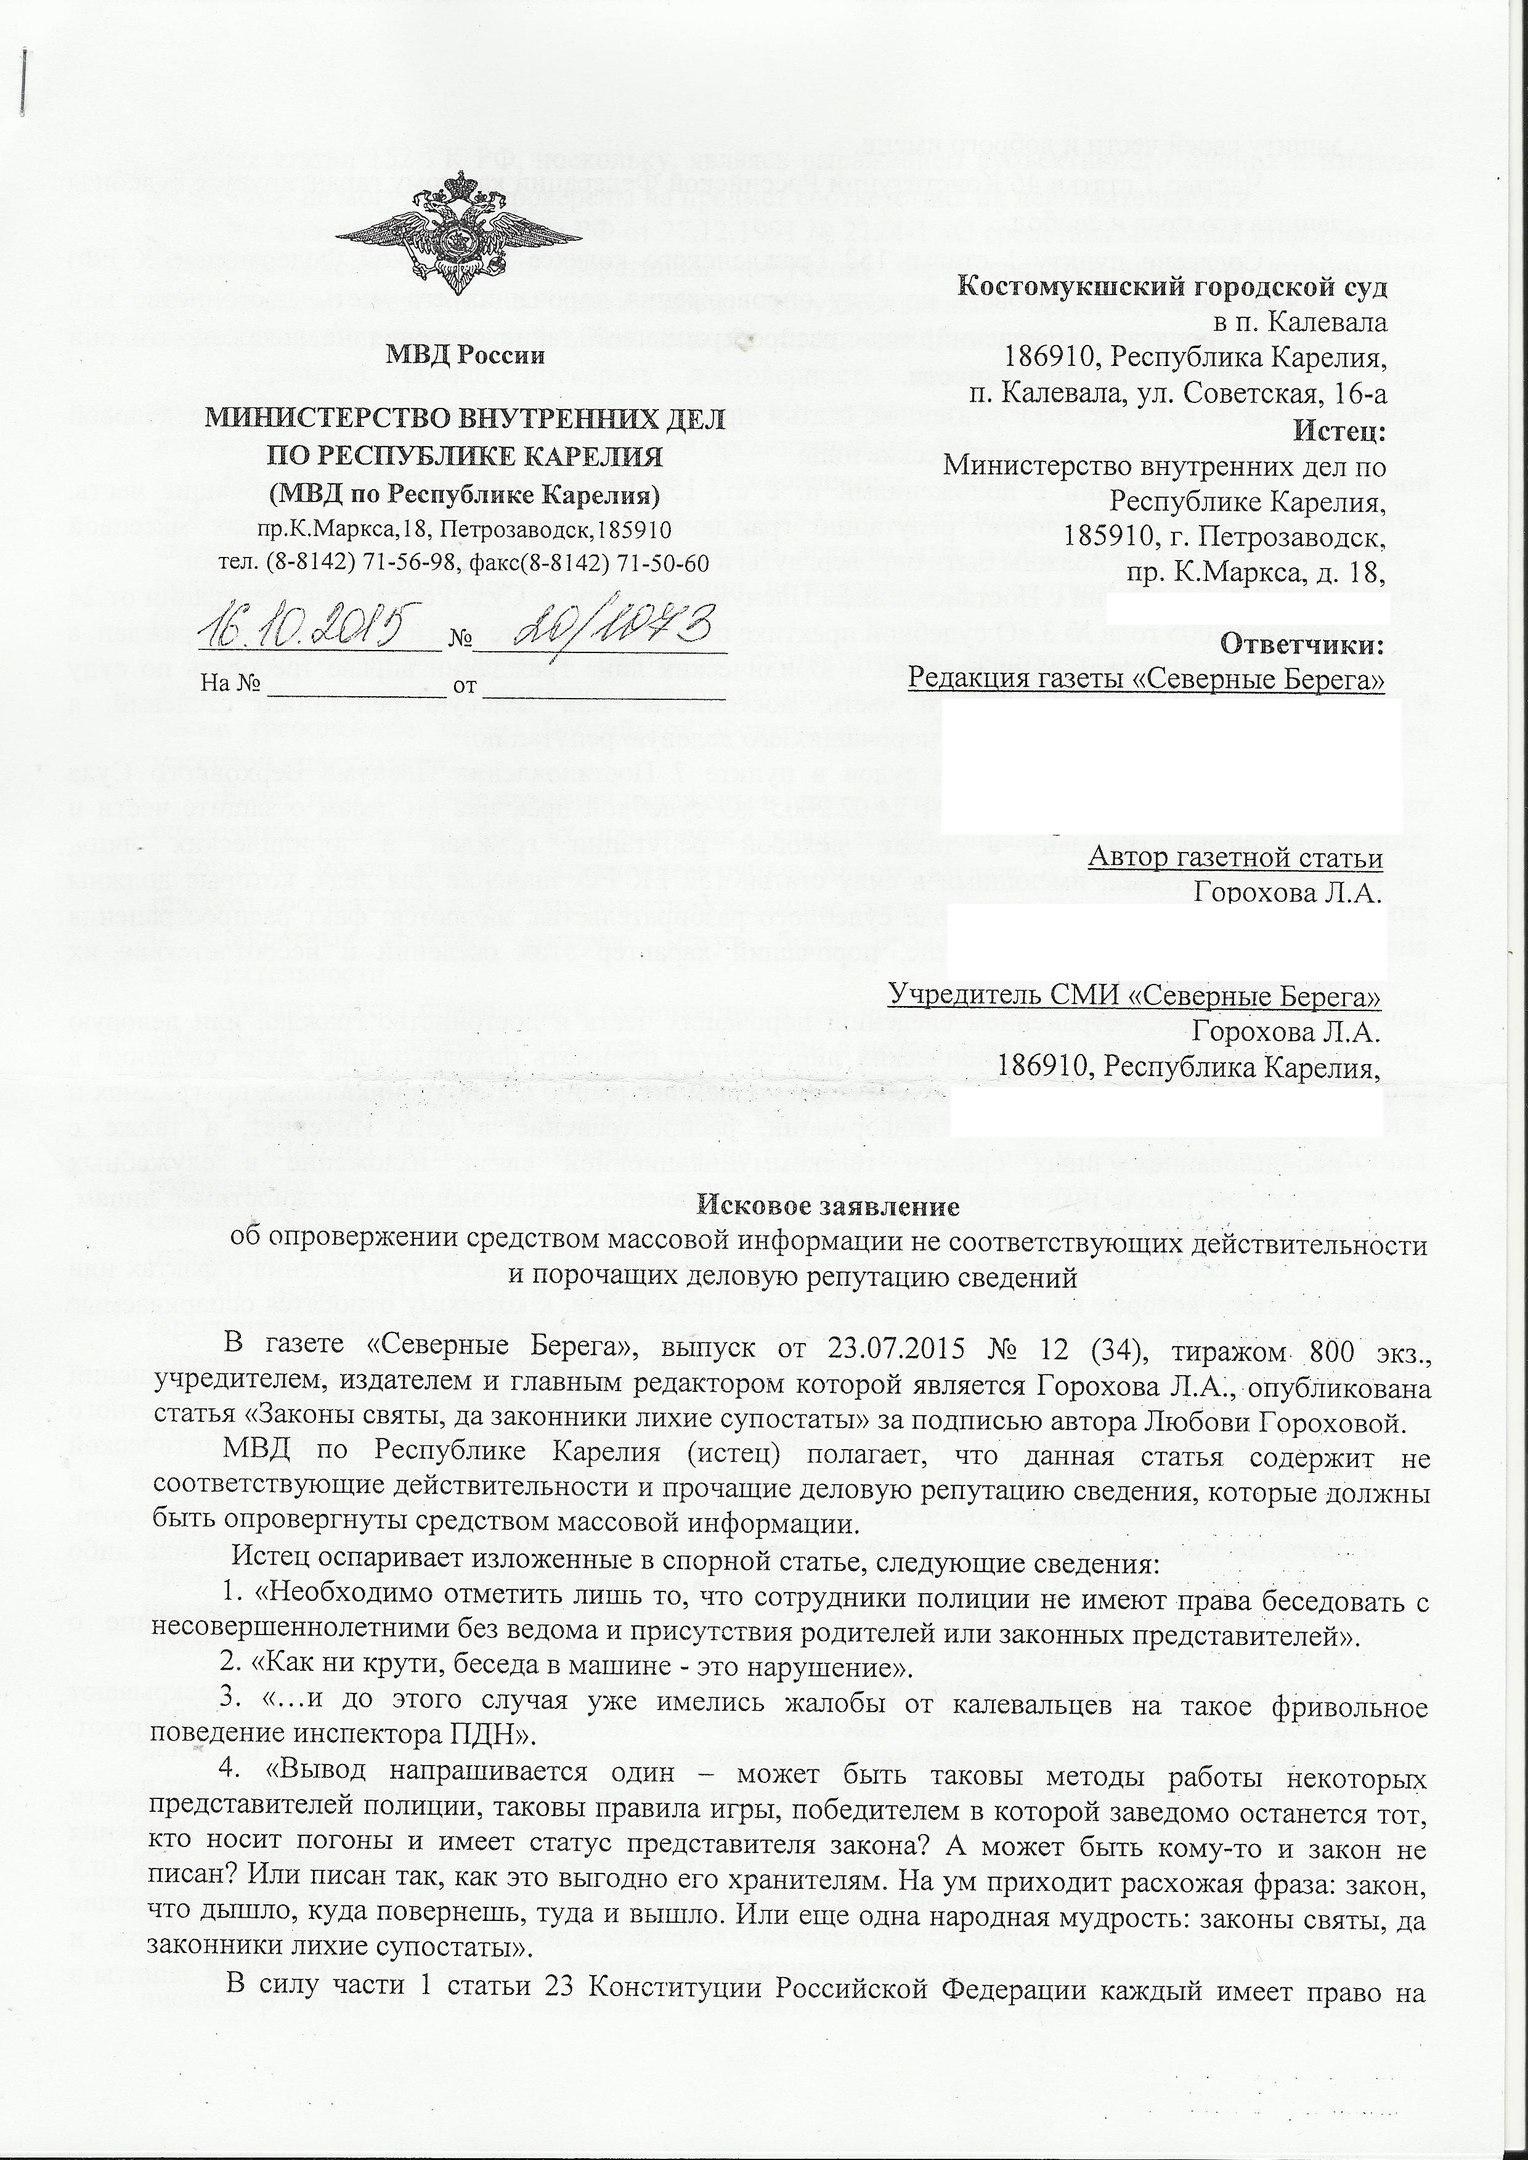 Новости Петрозаводска сегодня | СТОЛИЦА на Онего